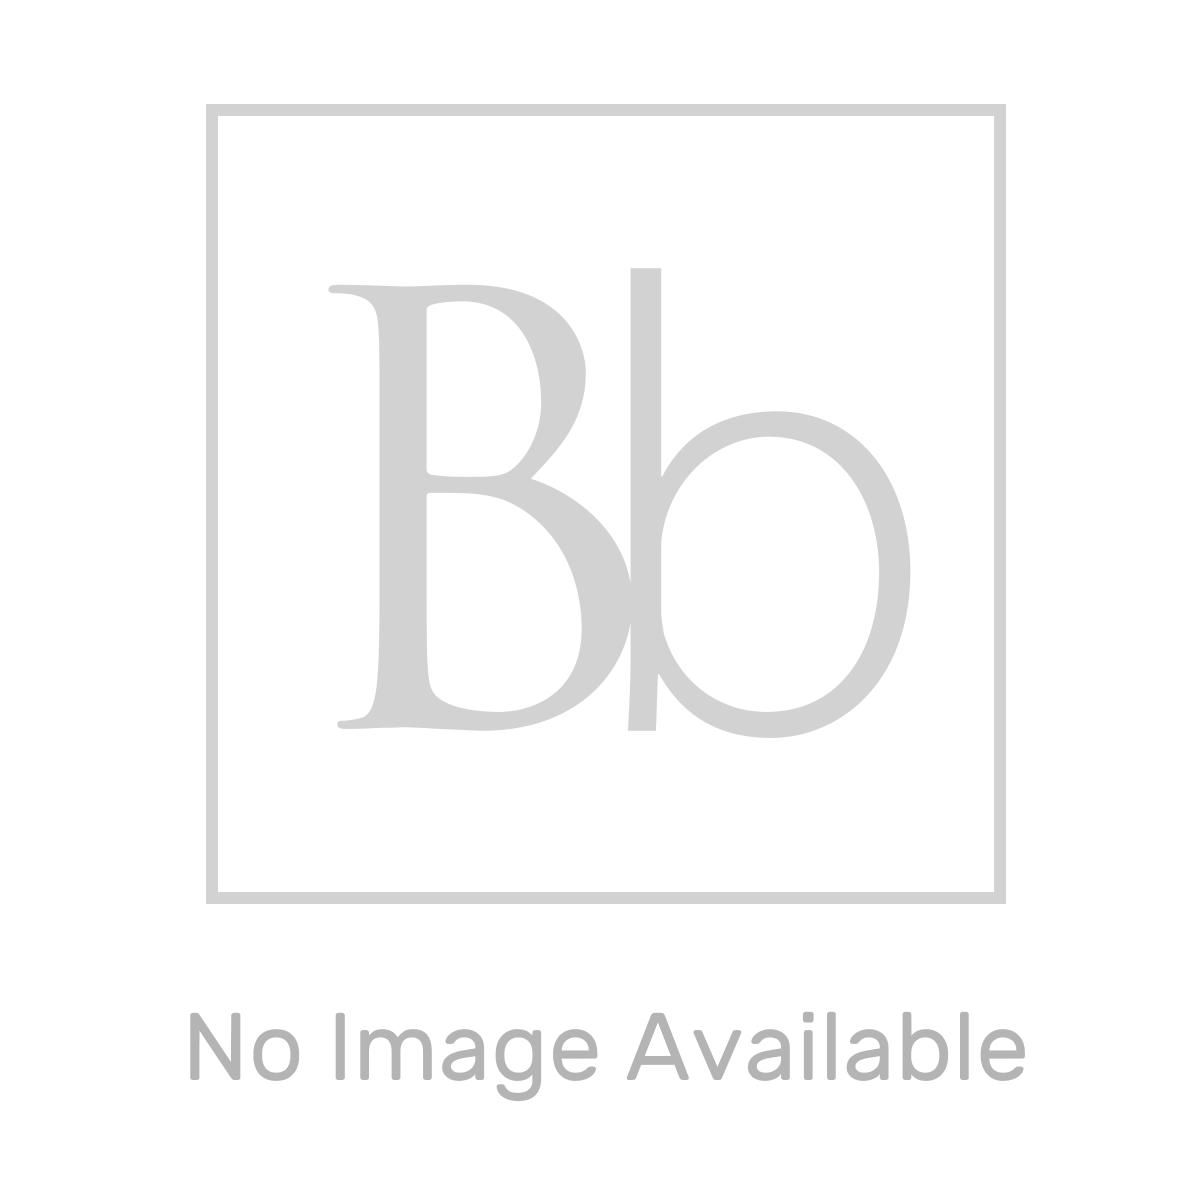 Cassellie Socorro Thermostatic Bath Filler Shower Kit Dimensions